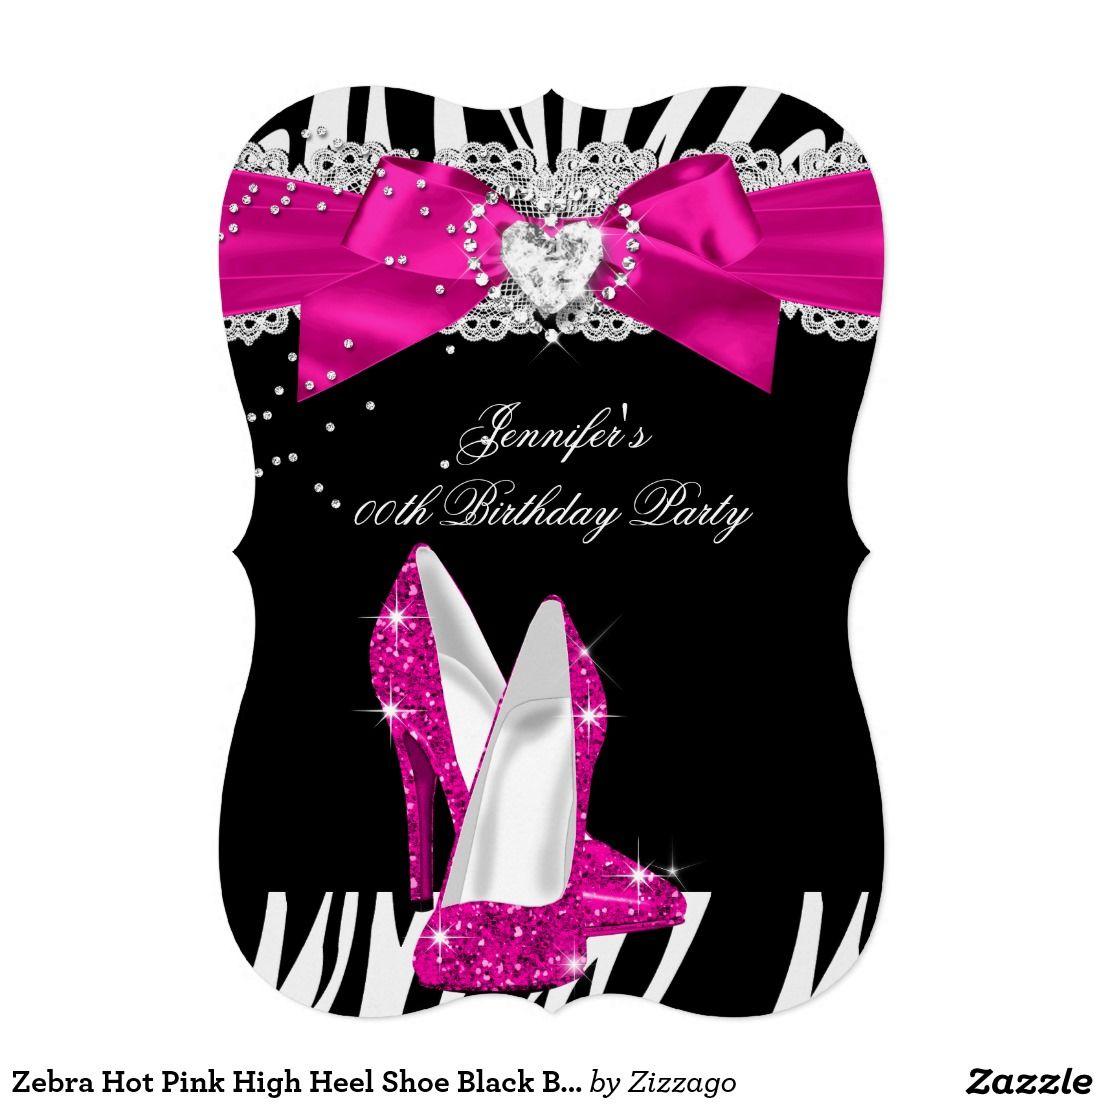 Zebra Hot Pink High Heel Shoe Black Birthday 4 Card Pink high